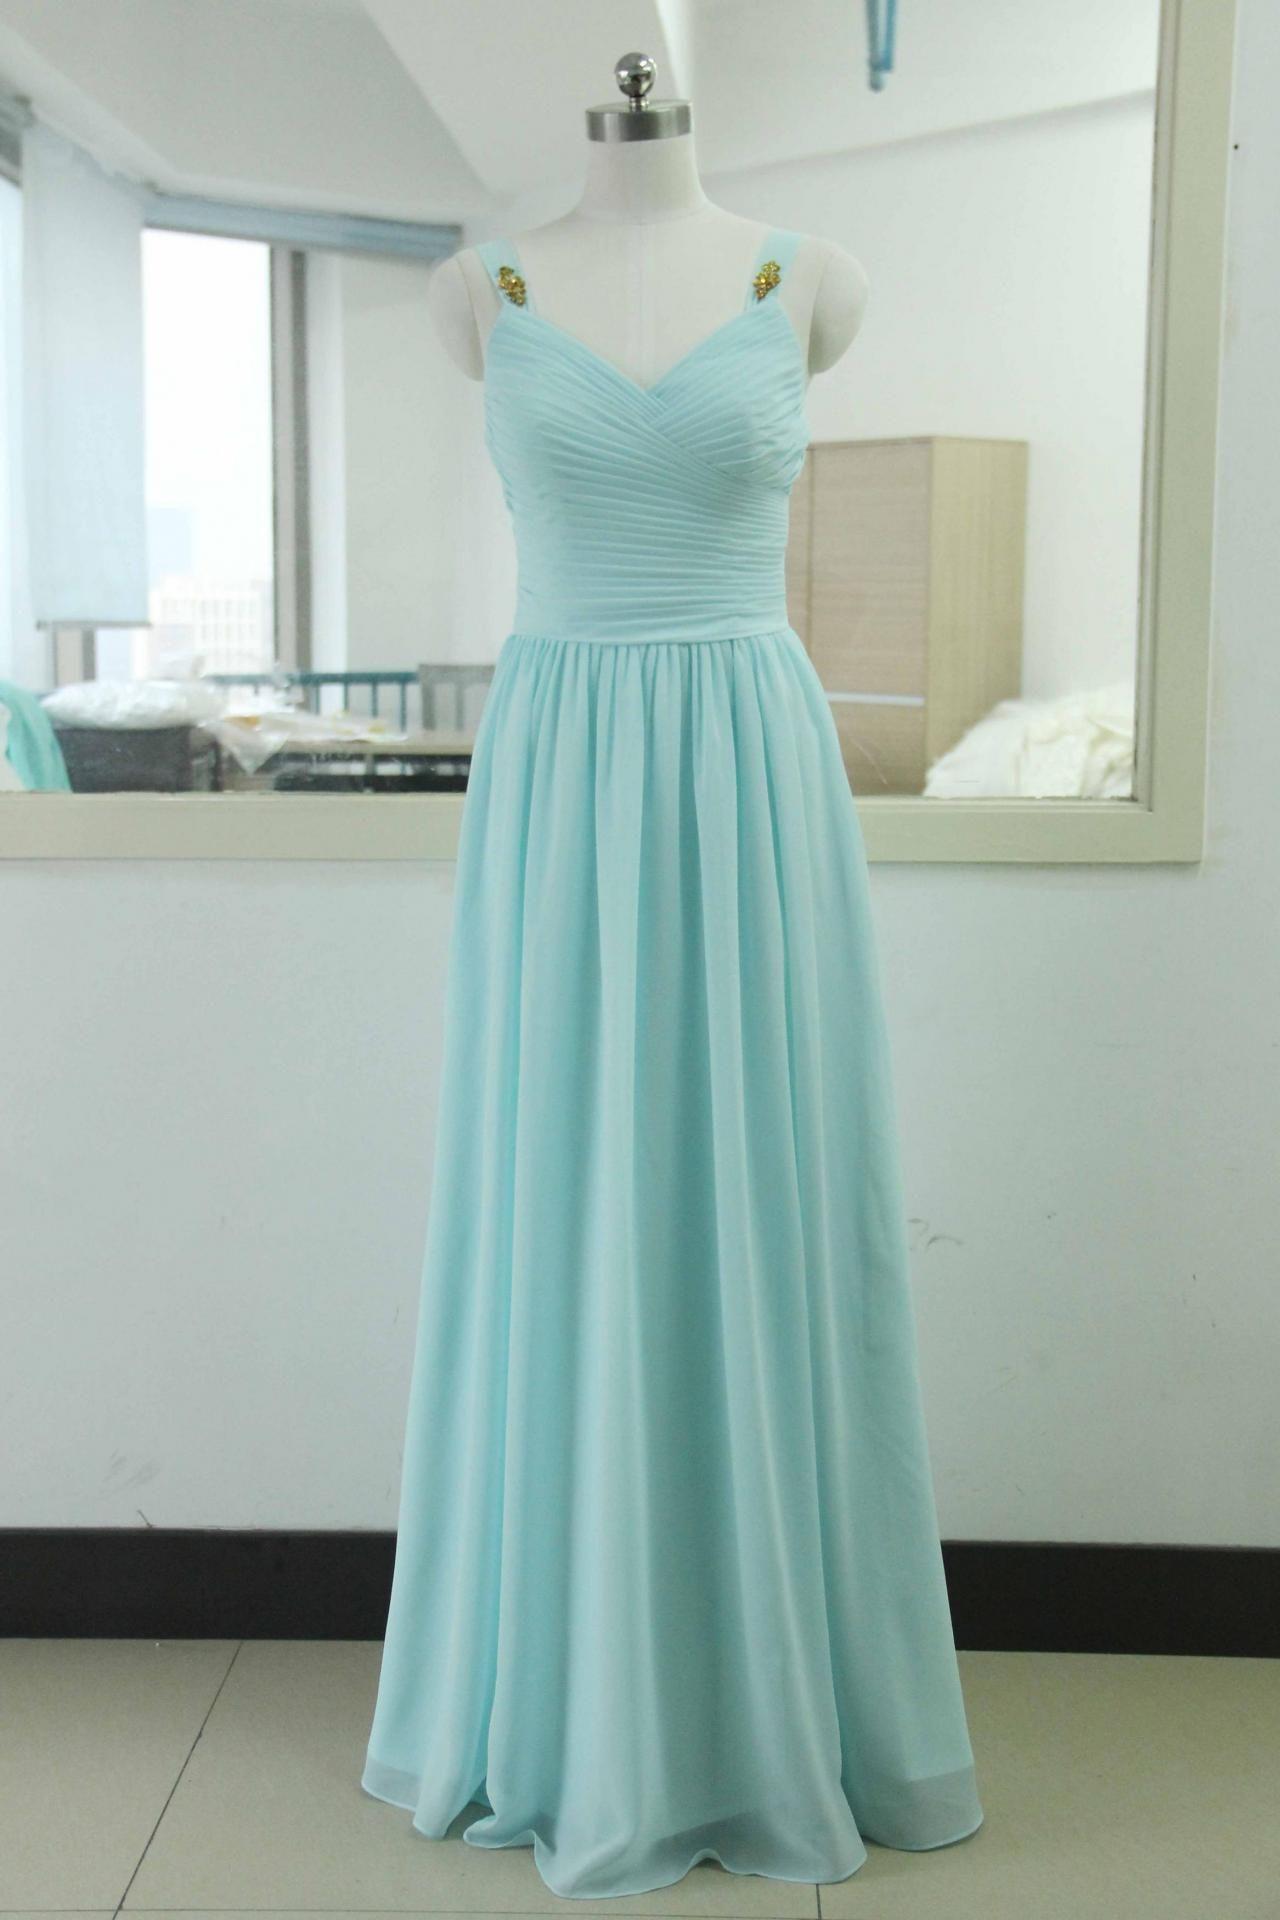 Classy Elegant Long Chiffon Prom Dresses,Charming Party Gowns ...